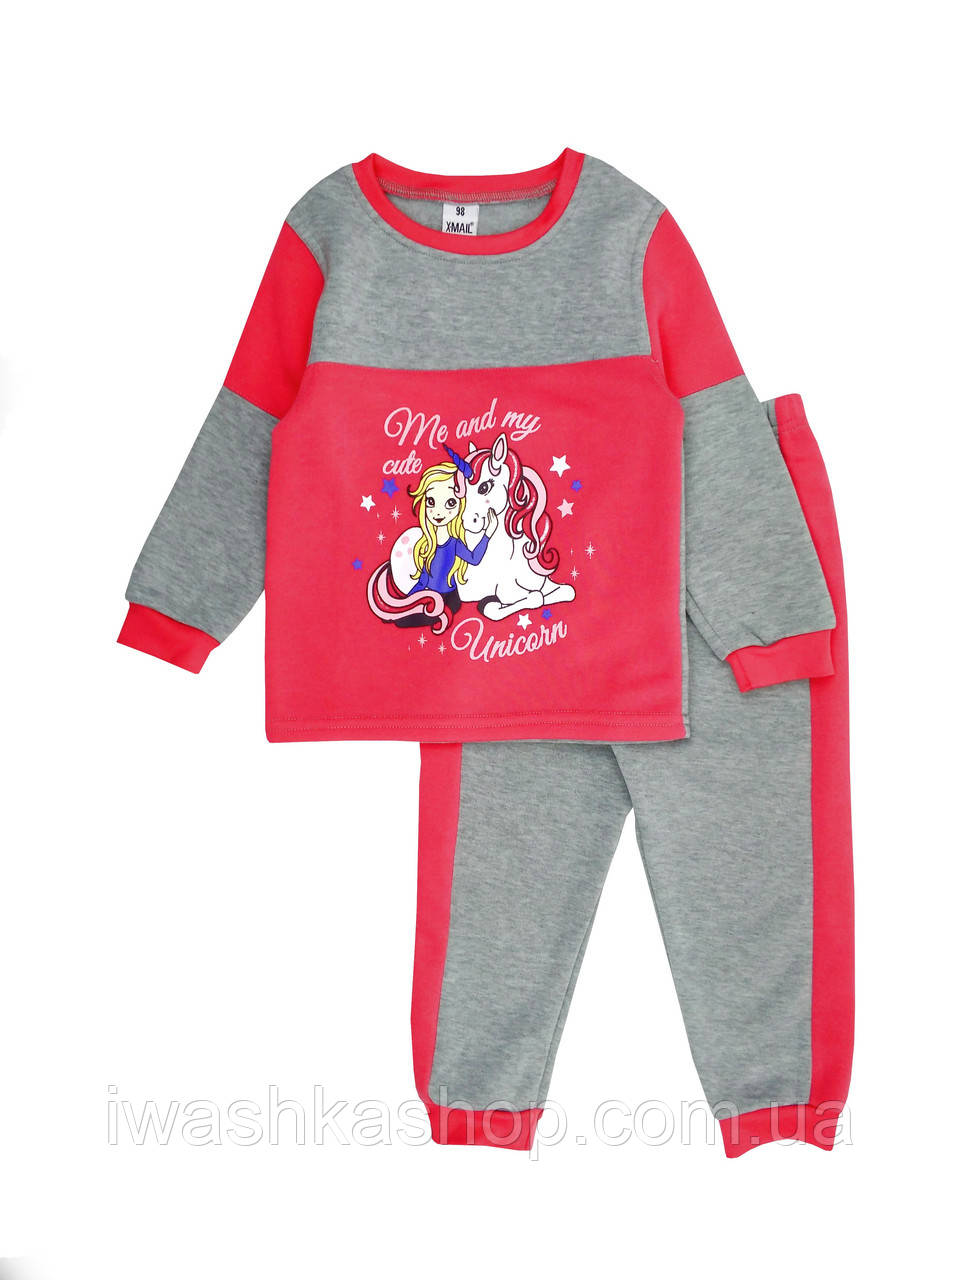 Теплый костюм с единорогом на девочек 1,5 - 2 лет, р. 92, X- Mail / KIK